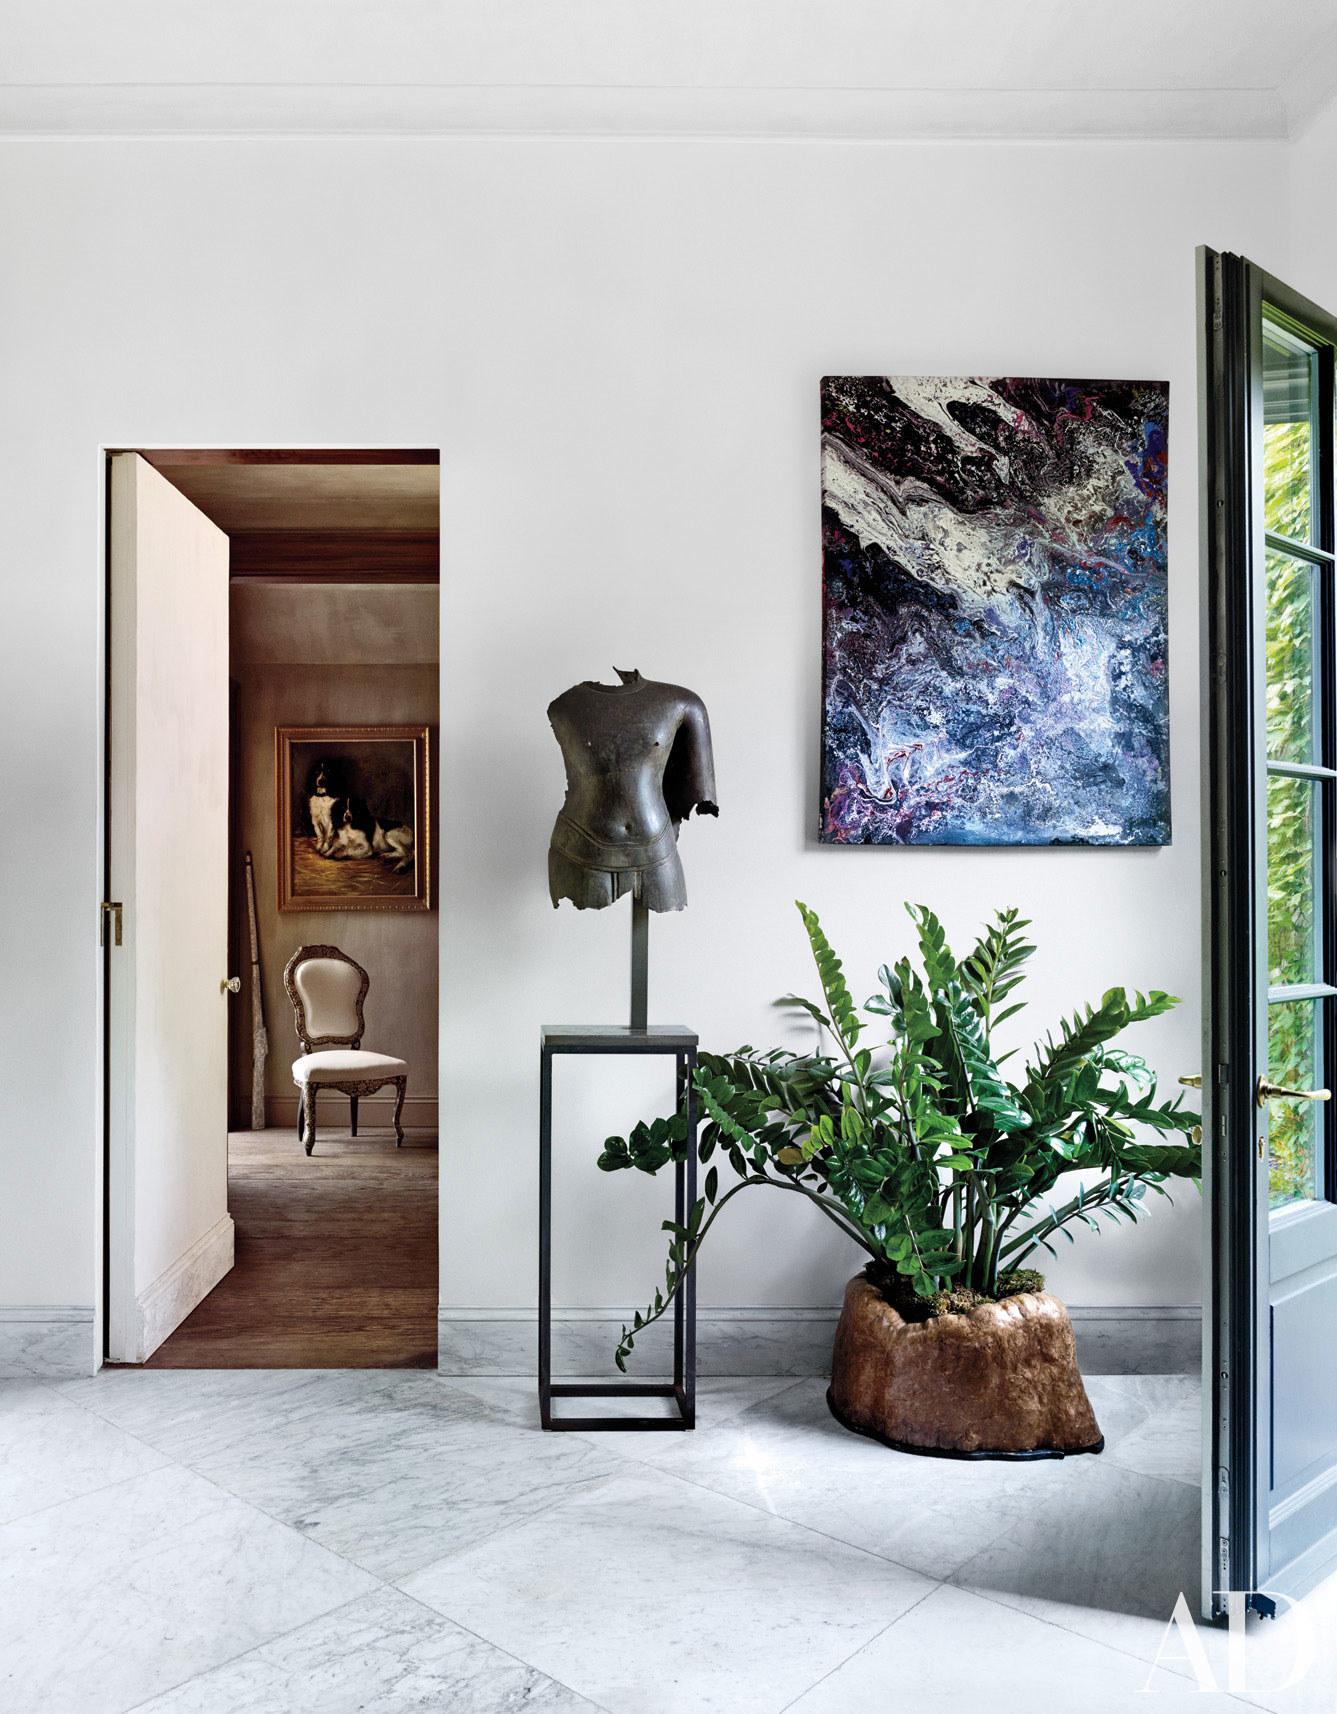 Exceptionnel Vervoordt Designed Betty Gertz Dallas Home 06